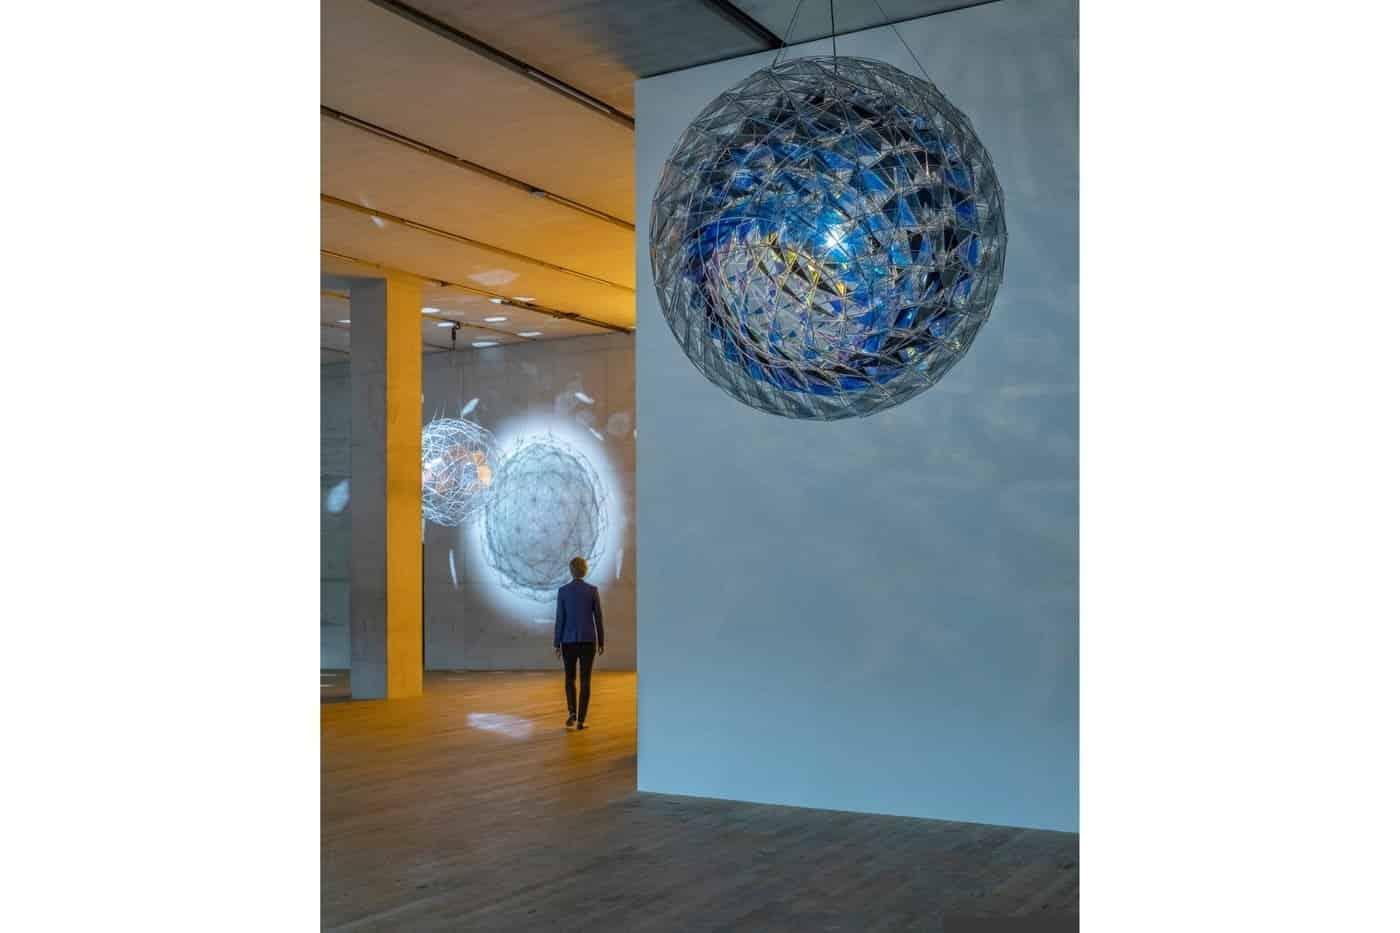 Cold wind sphere, 2012. Anders Sune Berg. Gift of the Clarence Westbury Foundation, 2013. Centre Pompidou, Musée national d'art modern, Centre de creation industrielle, Paris. © 2012 Olafur Eliasson